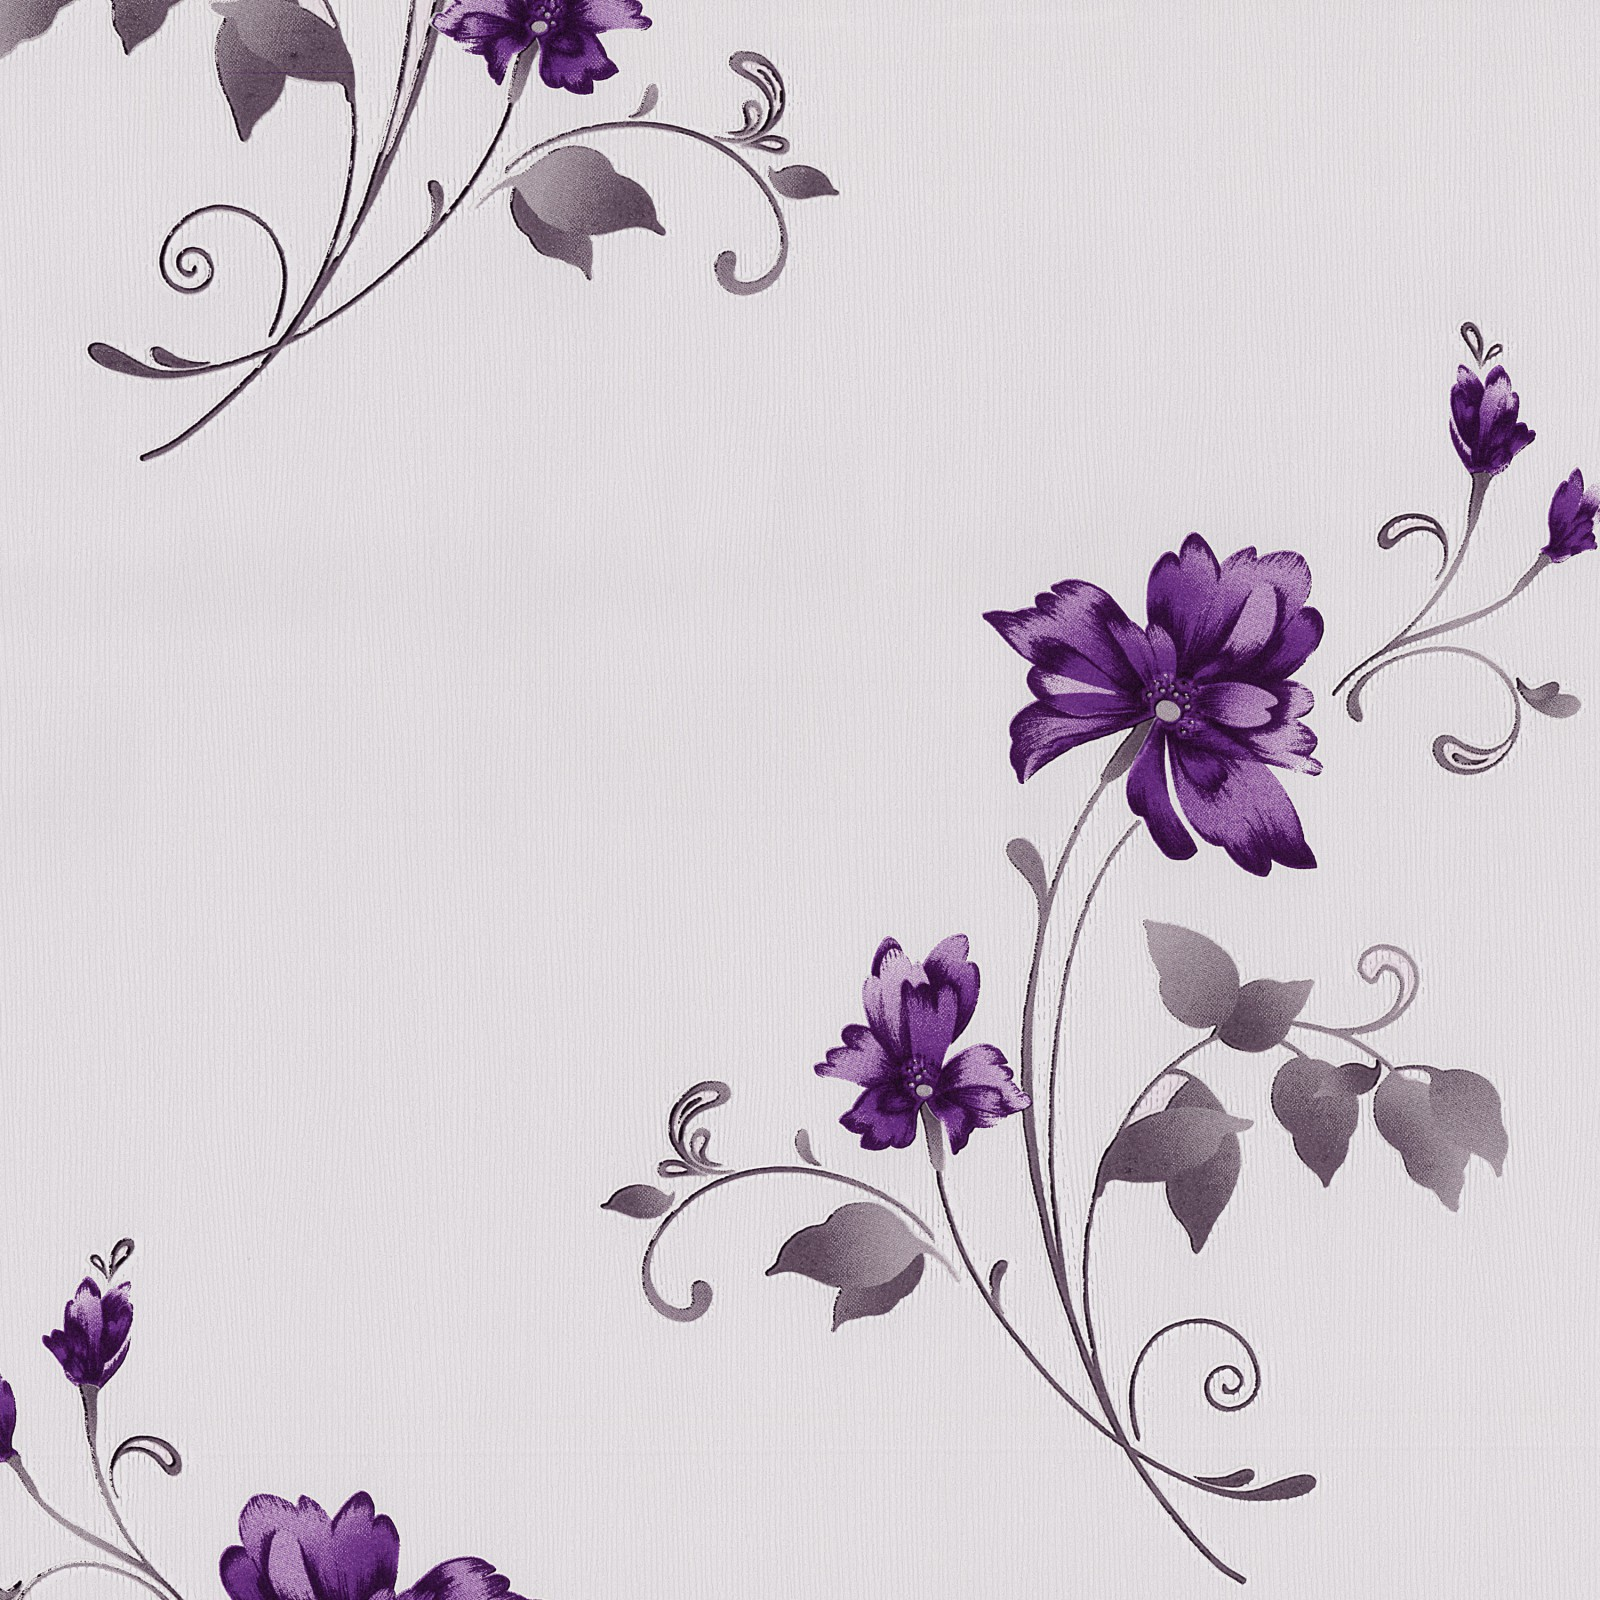 Vliestapete blumen flieder lila tapete p s pure easy 13285 40 for Lila tapete mit muster